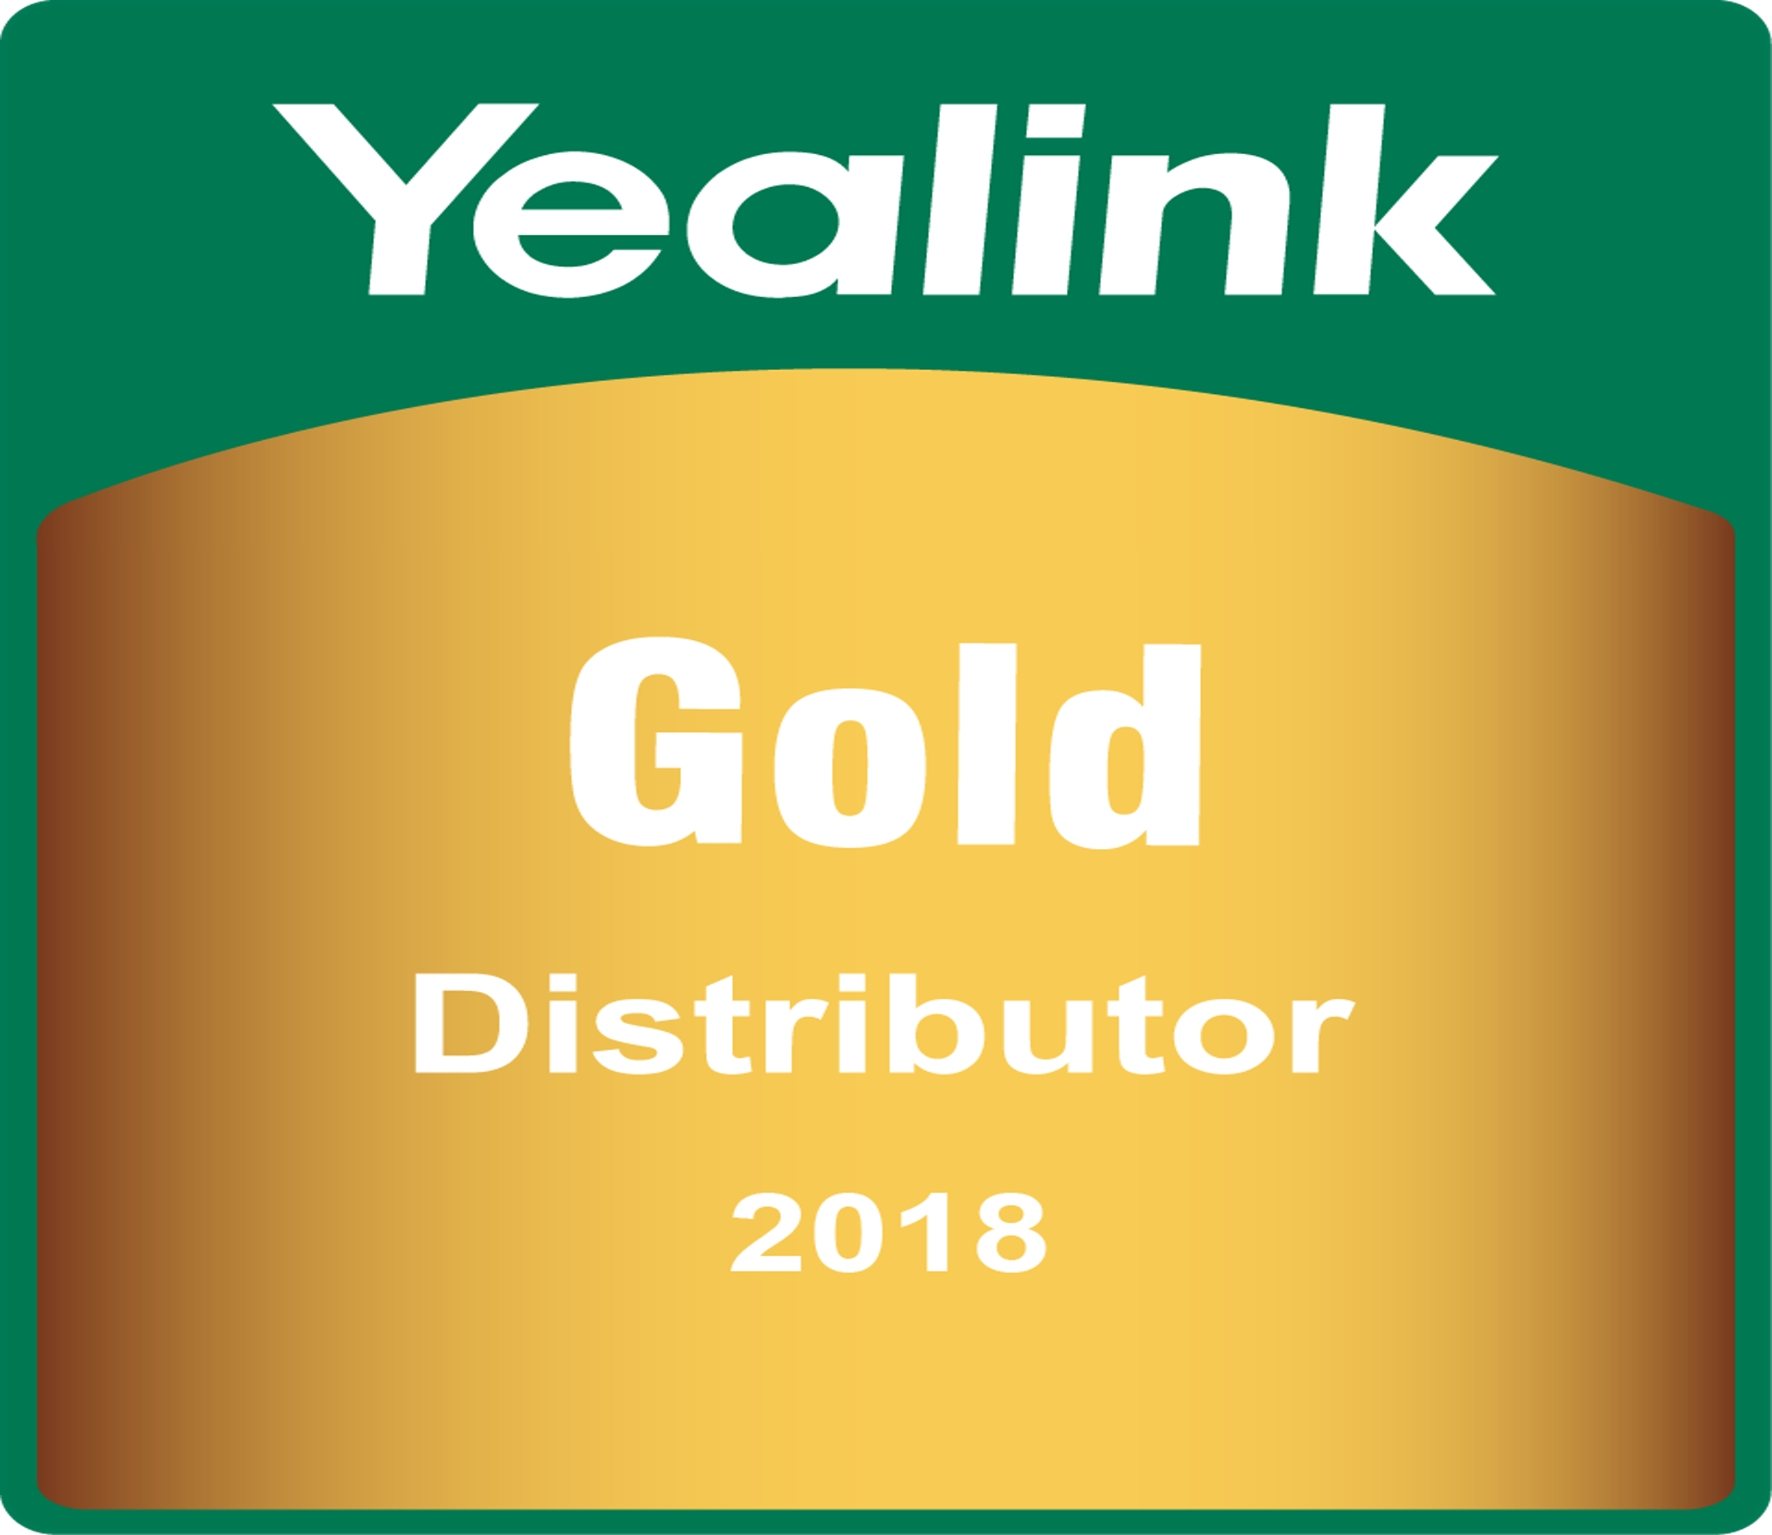 Jsme Gold Distributorem Yealink pro rok 2018